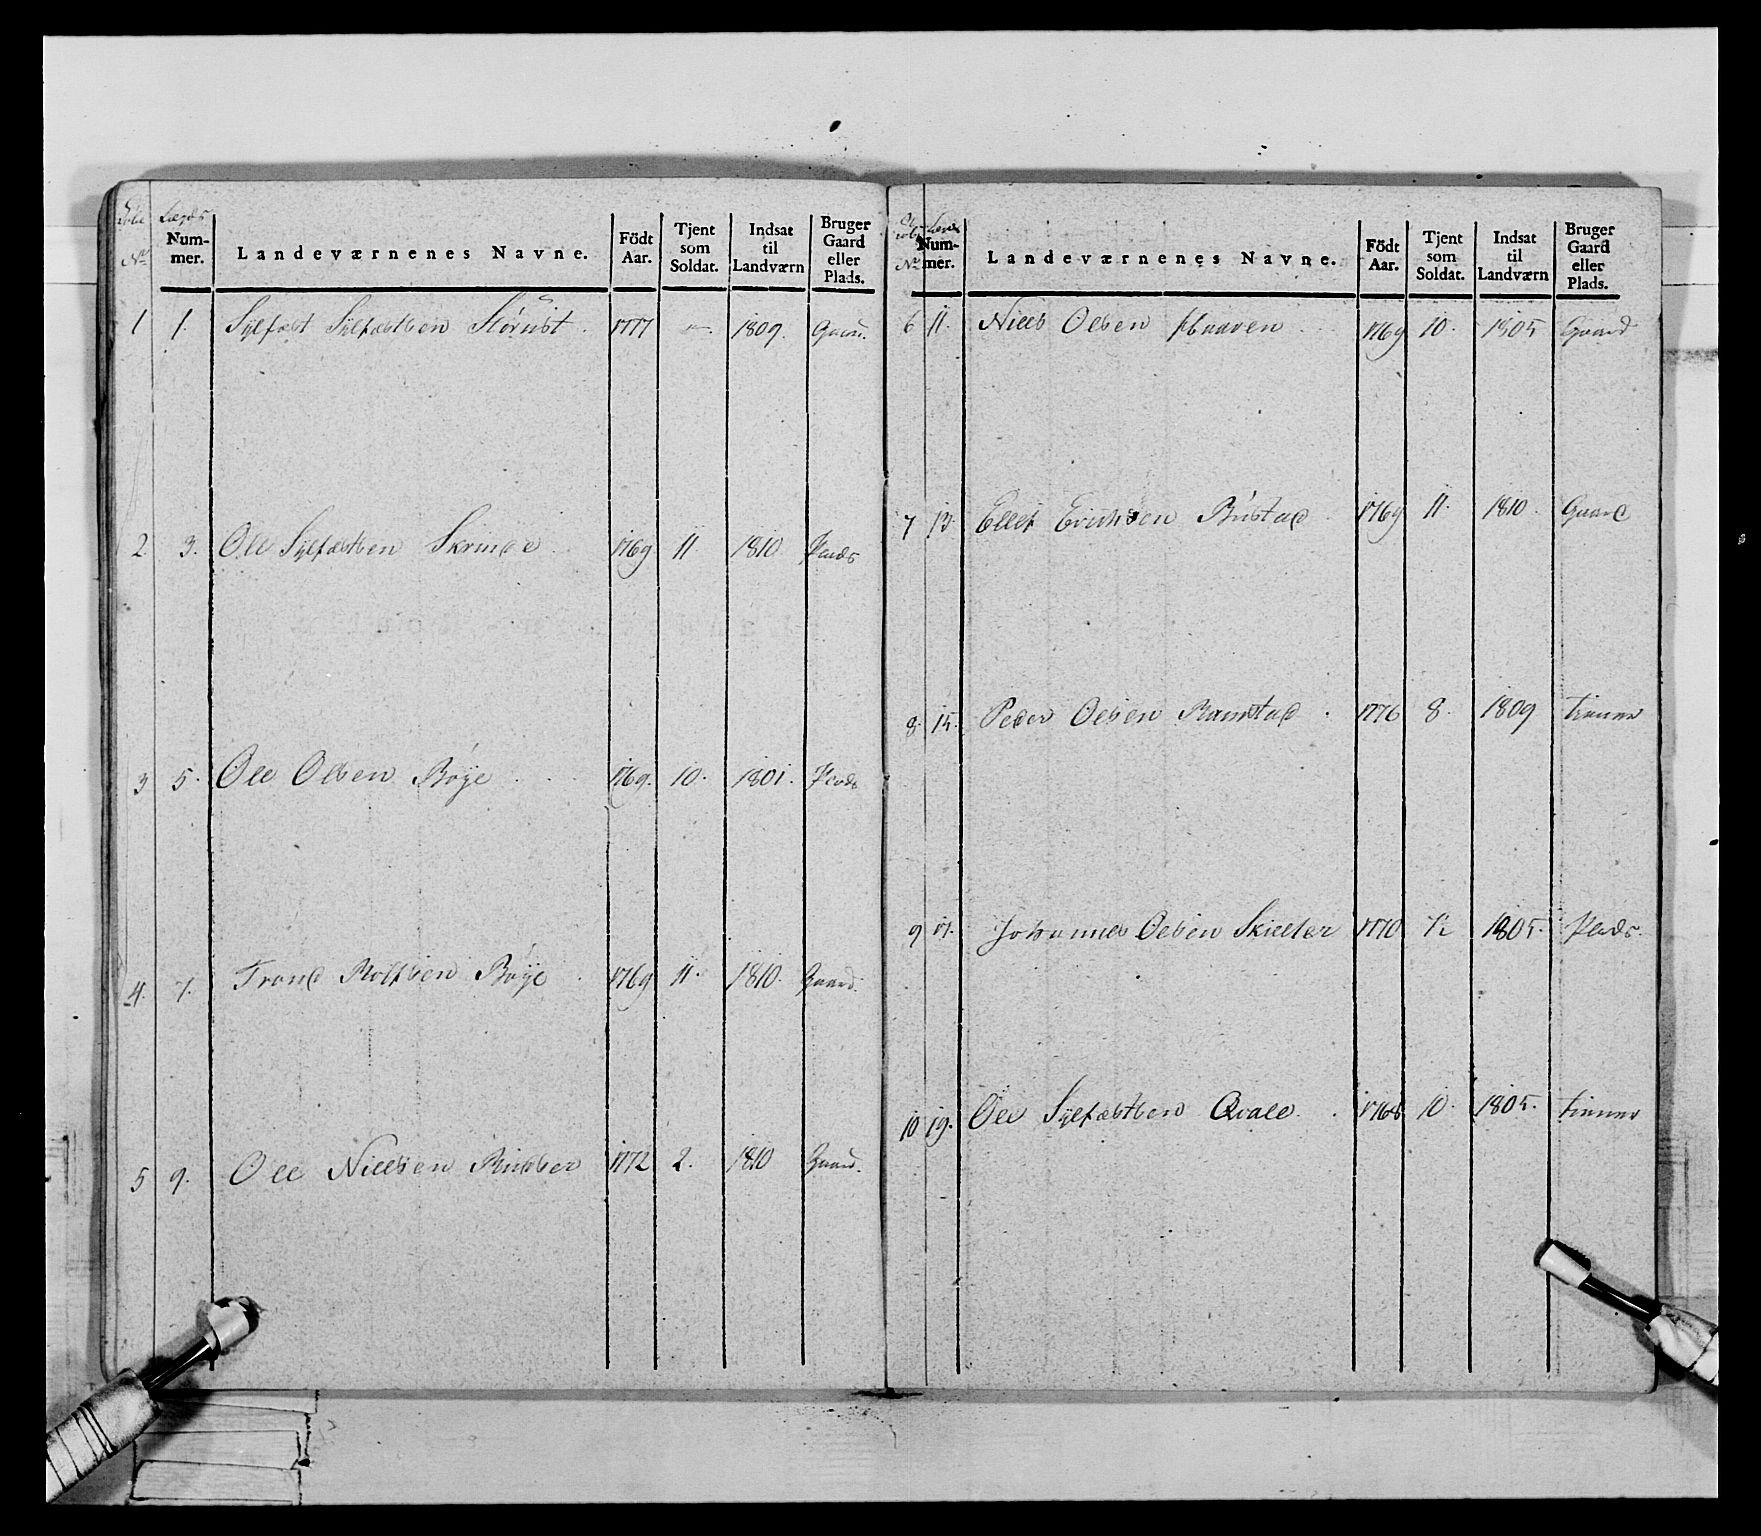 RA, Generalitets- og kommissariatskollegiet, Det kongelige norske kommissariatskollegium, E/Eh/L0069: Opplandske gevorbne infanteriregiment, 1810-1818, p. 646